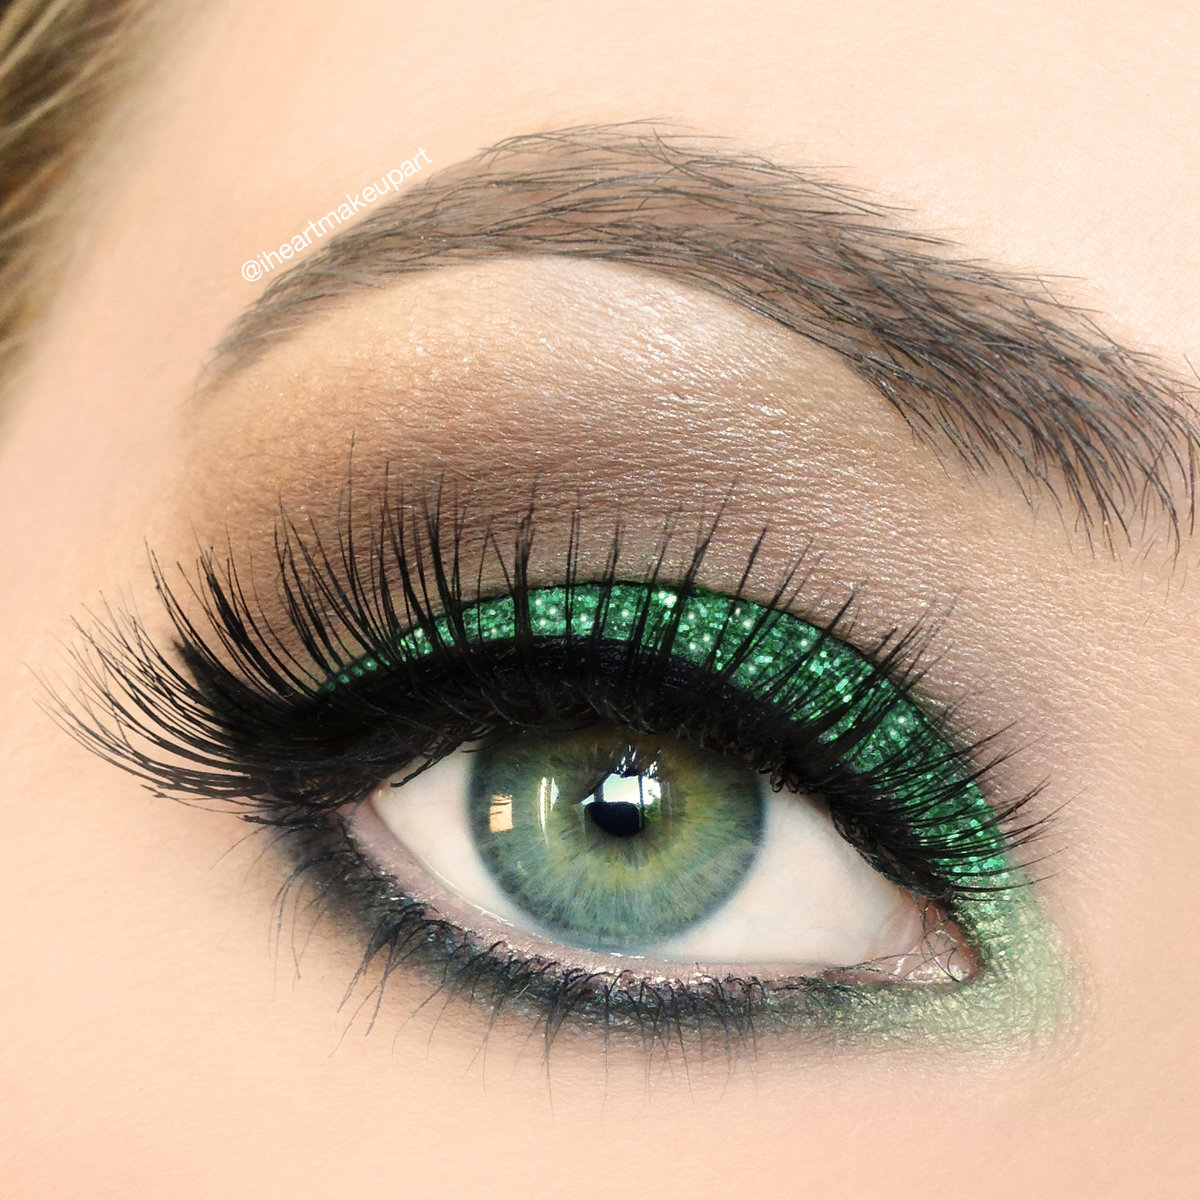 Макияж для глаз розово-зеленые тени фото